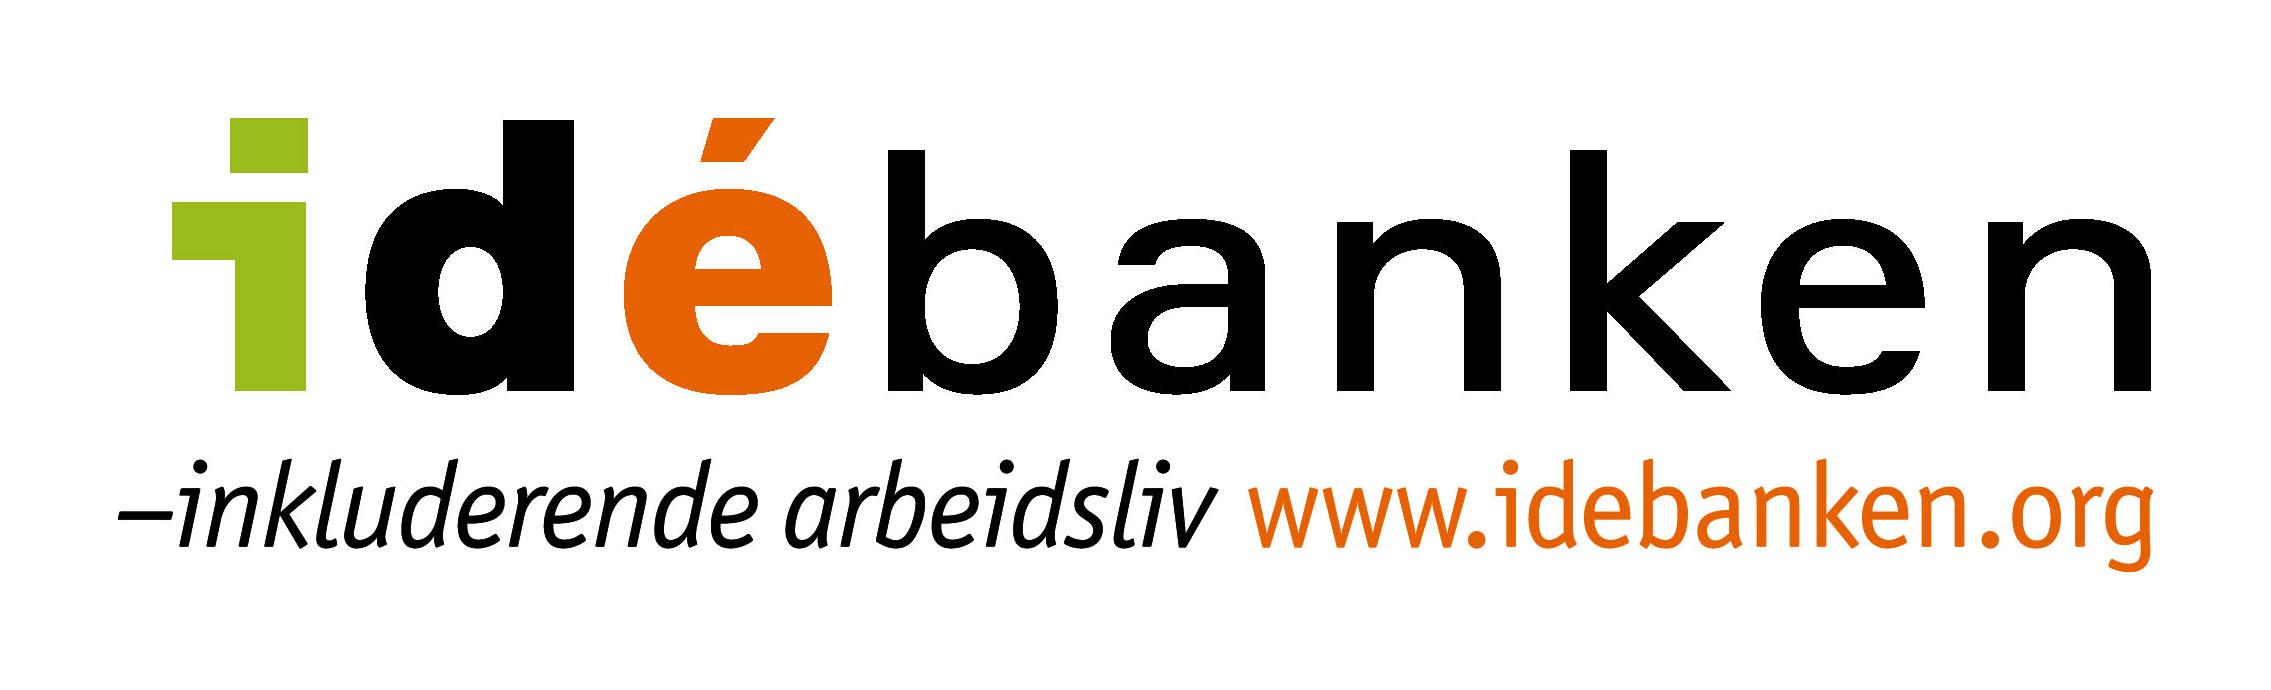 banner idebanken